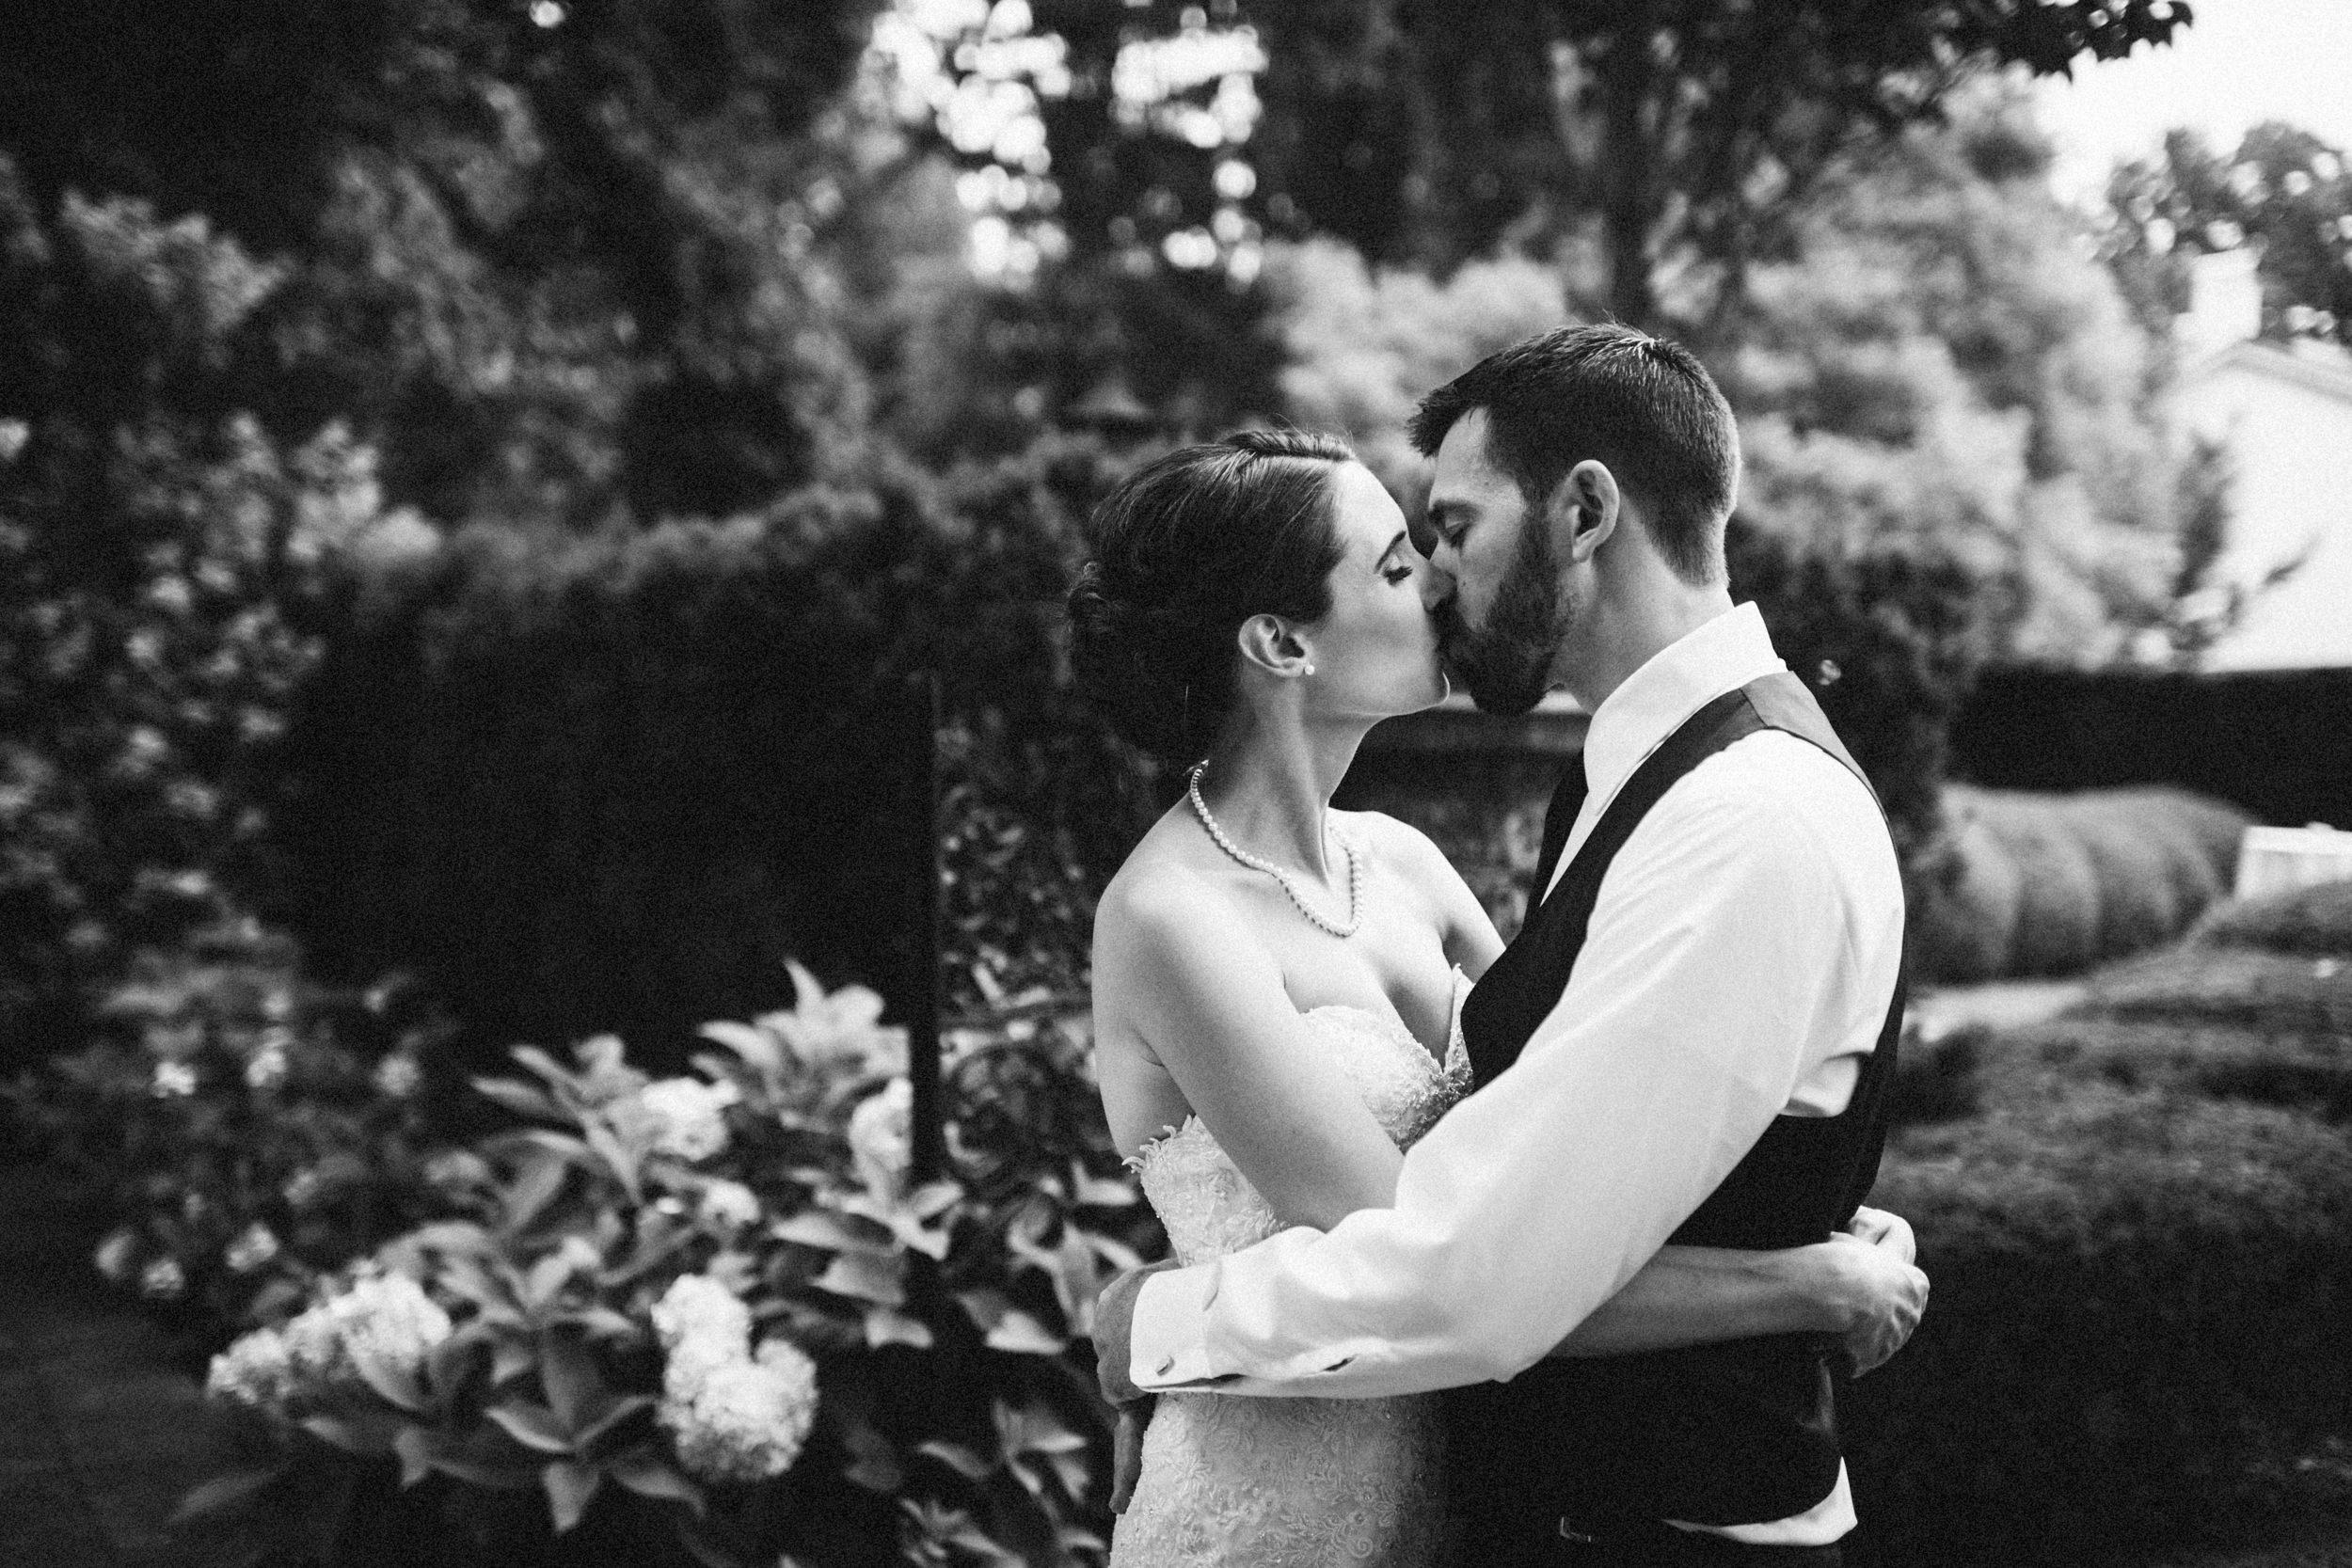 Louisville-Kentucky-Wedding-Elopement-Photographer-Sarah-Katherine-Davis-Photography-Whitehall-Classic-Timeless-Garden-Wedding-597.jpg